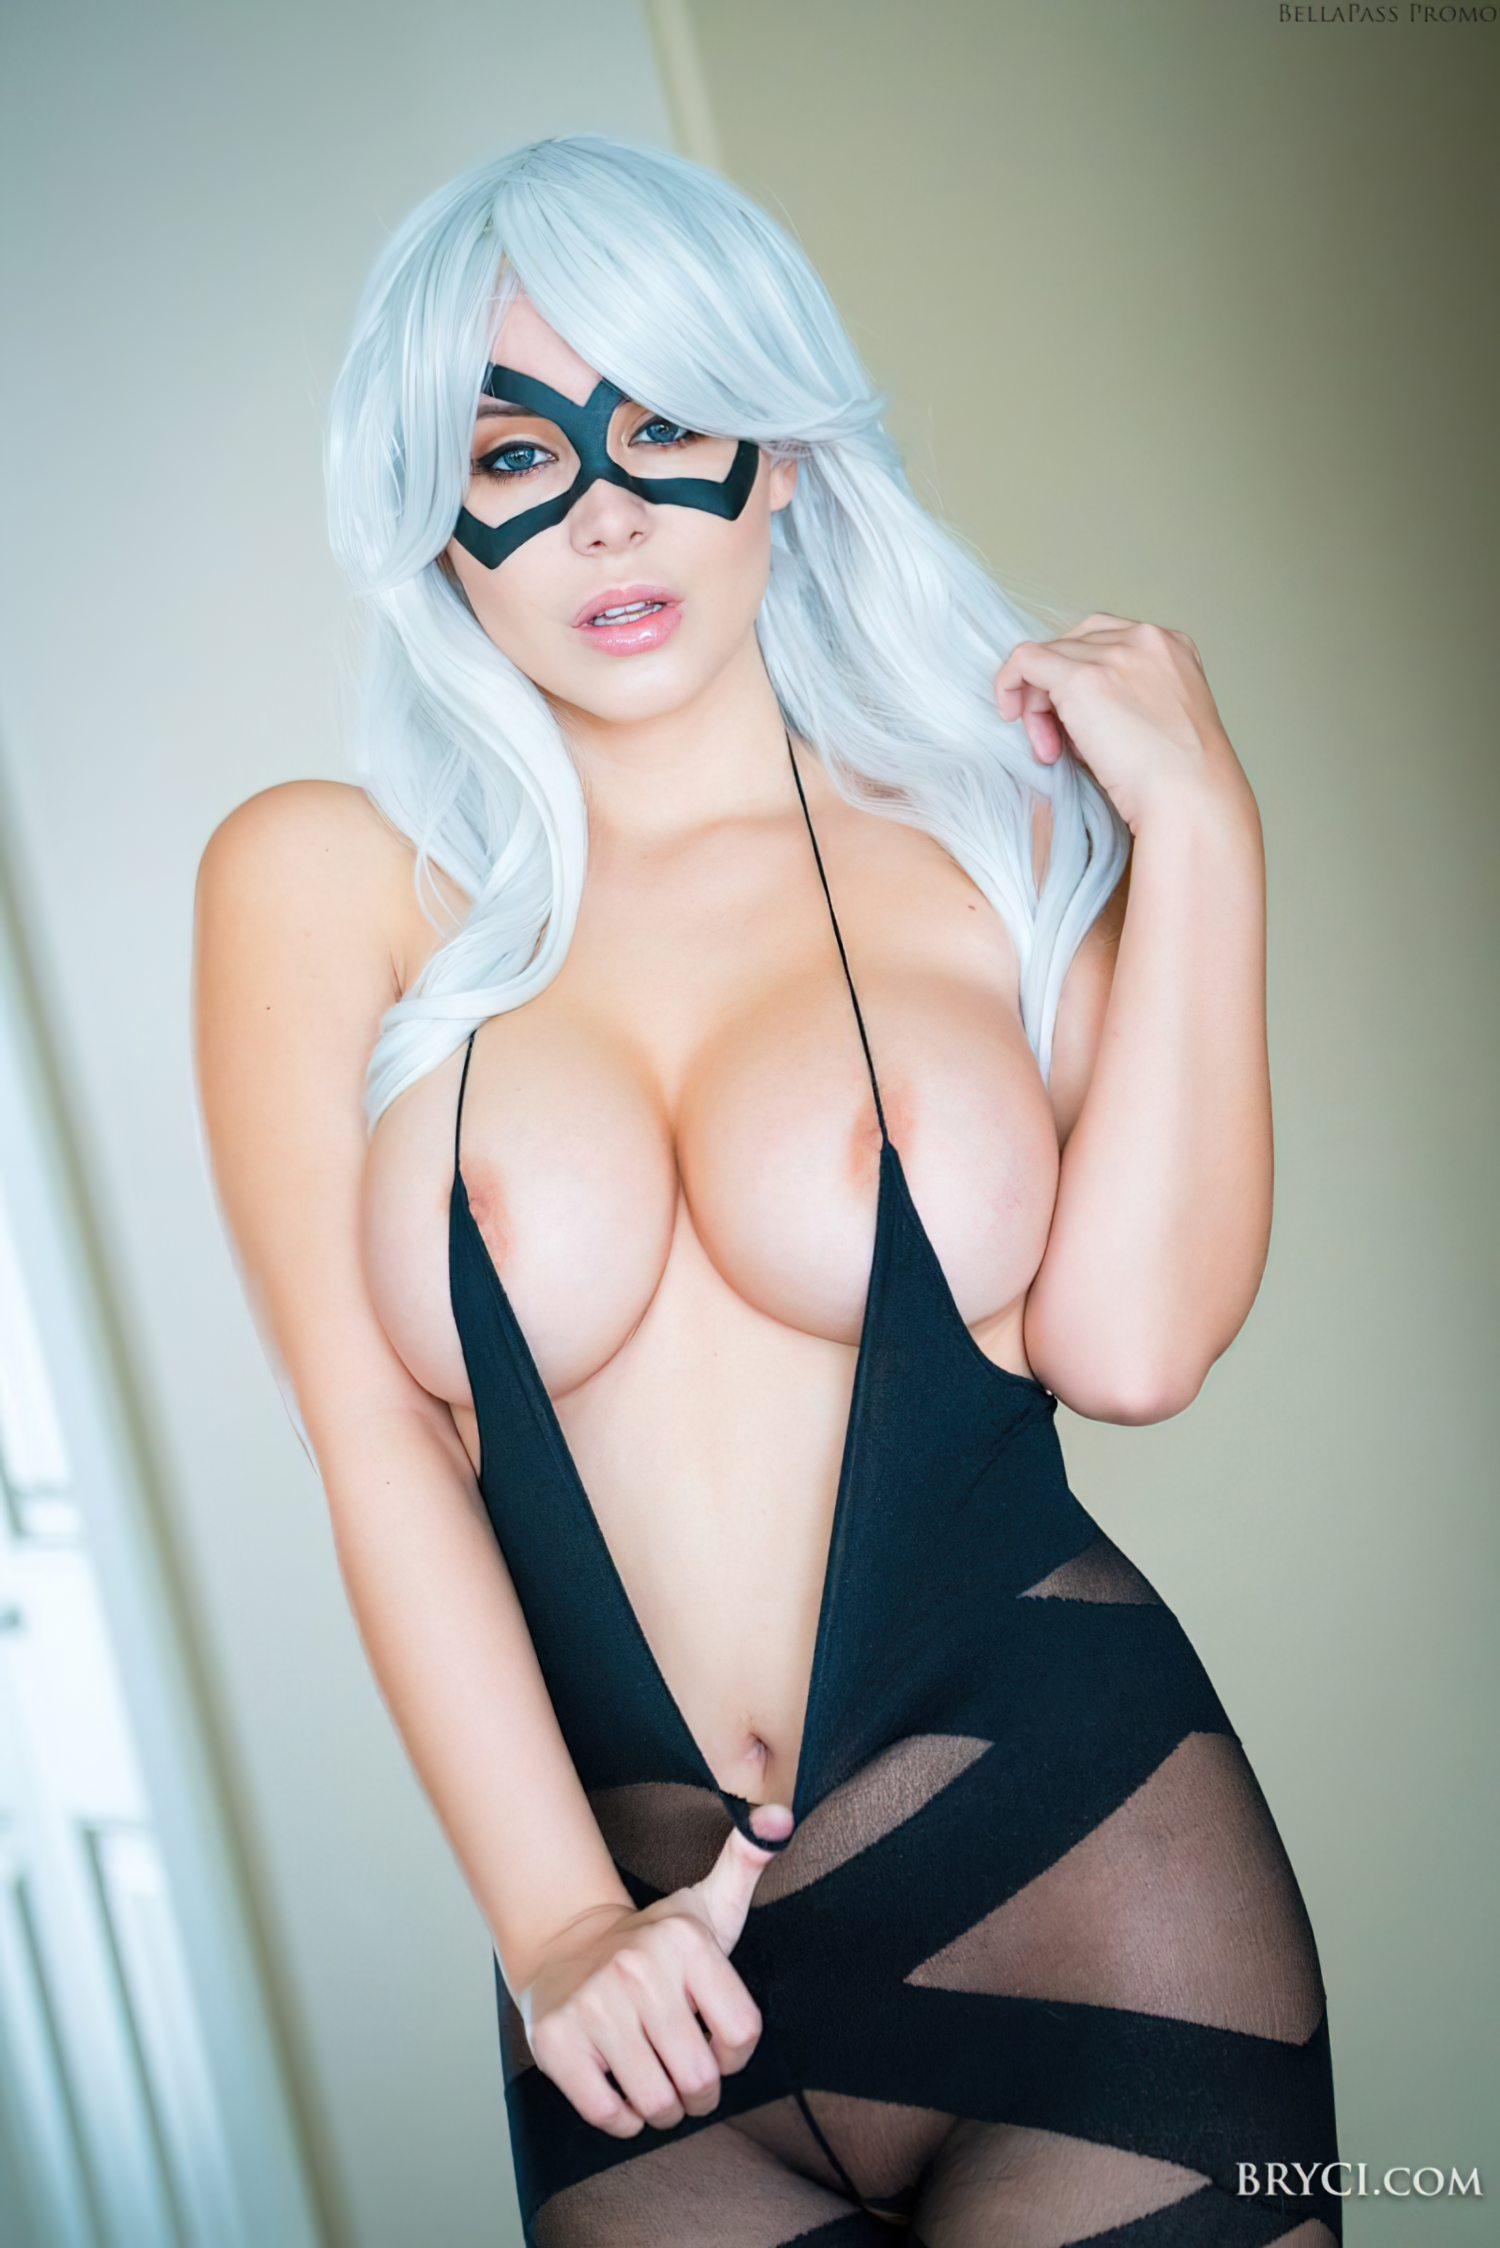 Bryci Catwoman Nua (5)